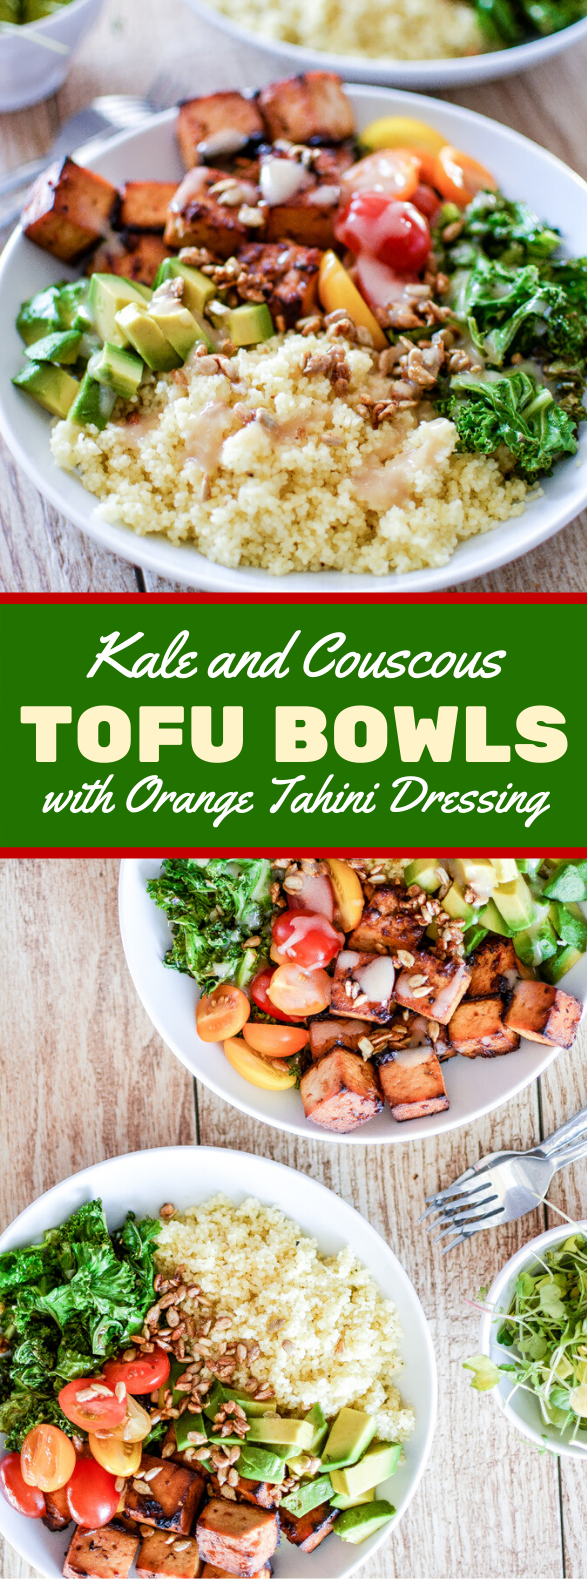 Kale and Couscous Tofu Bowls with Orange Tahini Dressing #vegetarian #weeknightdinner